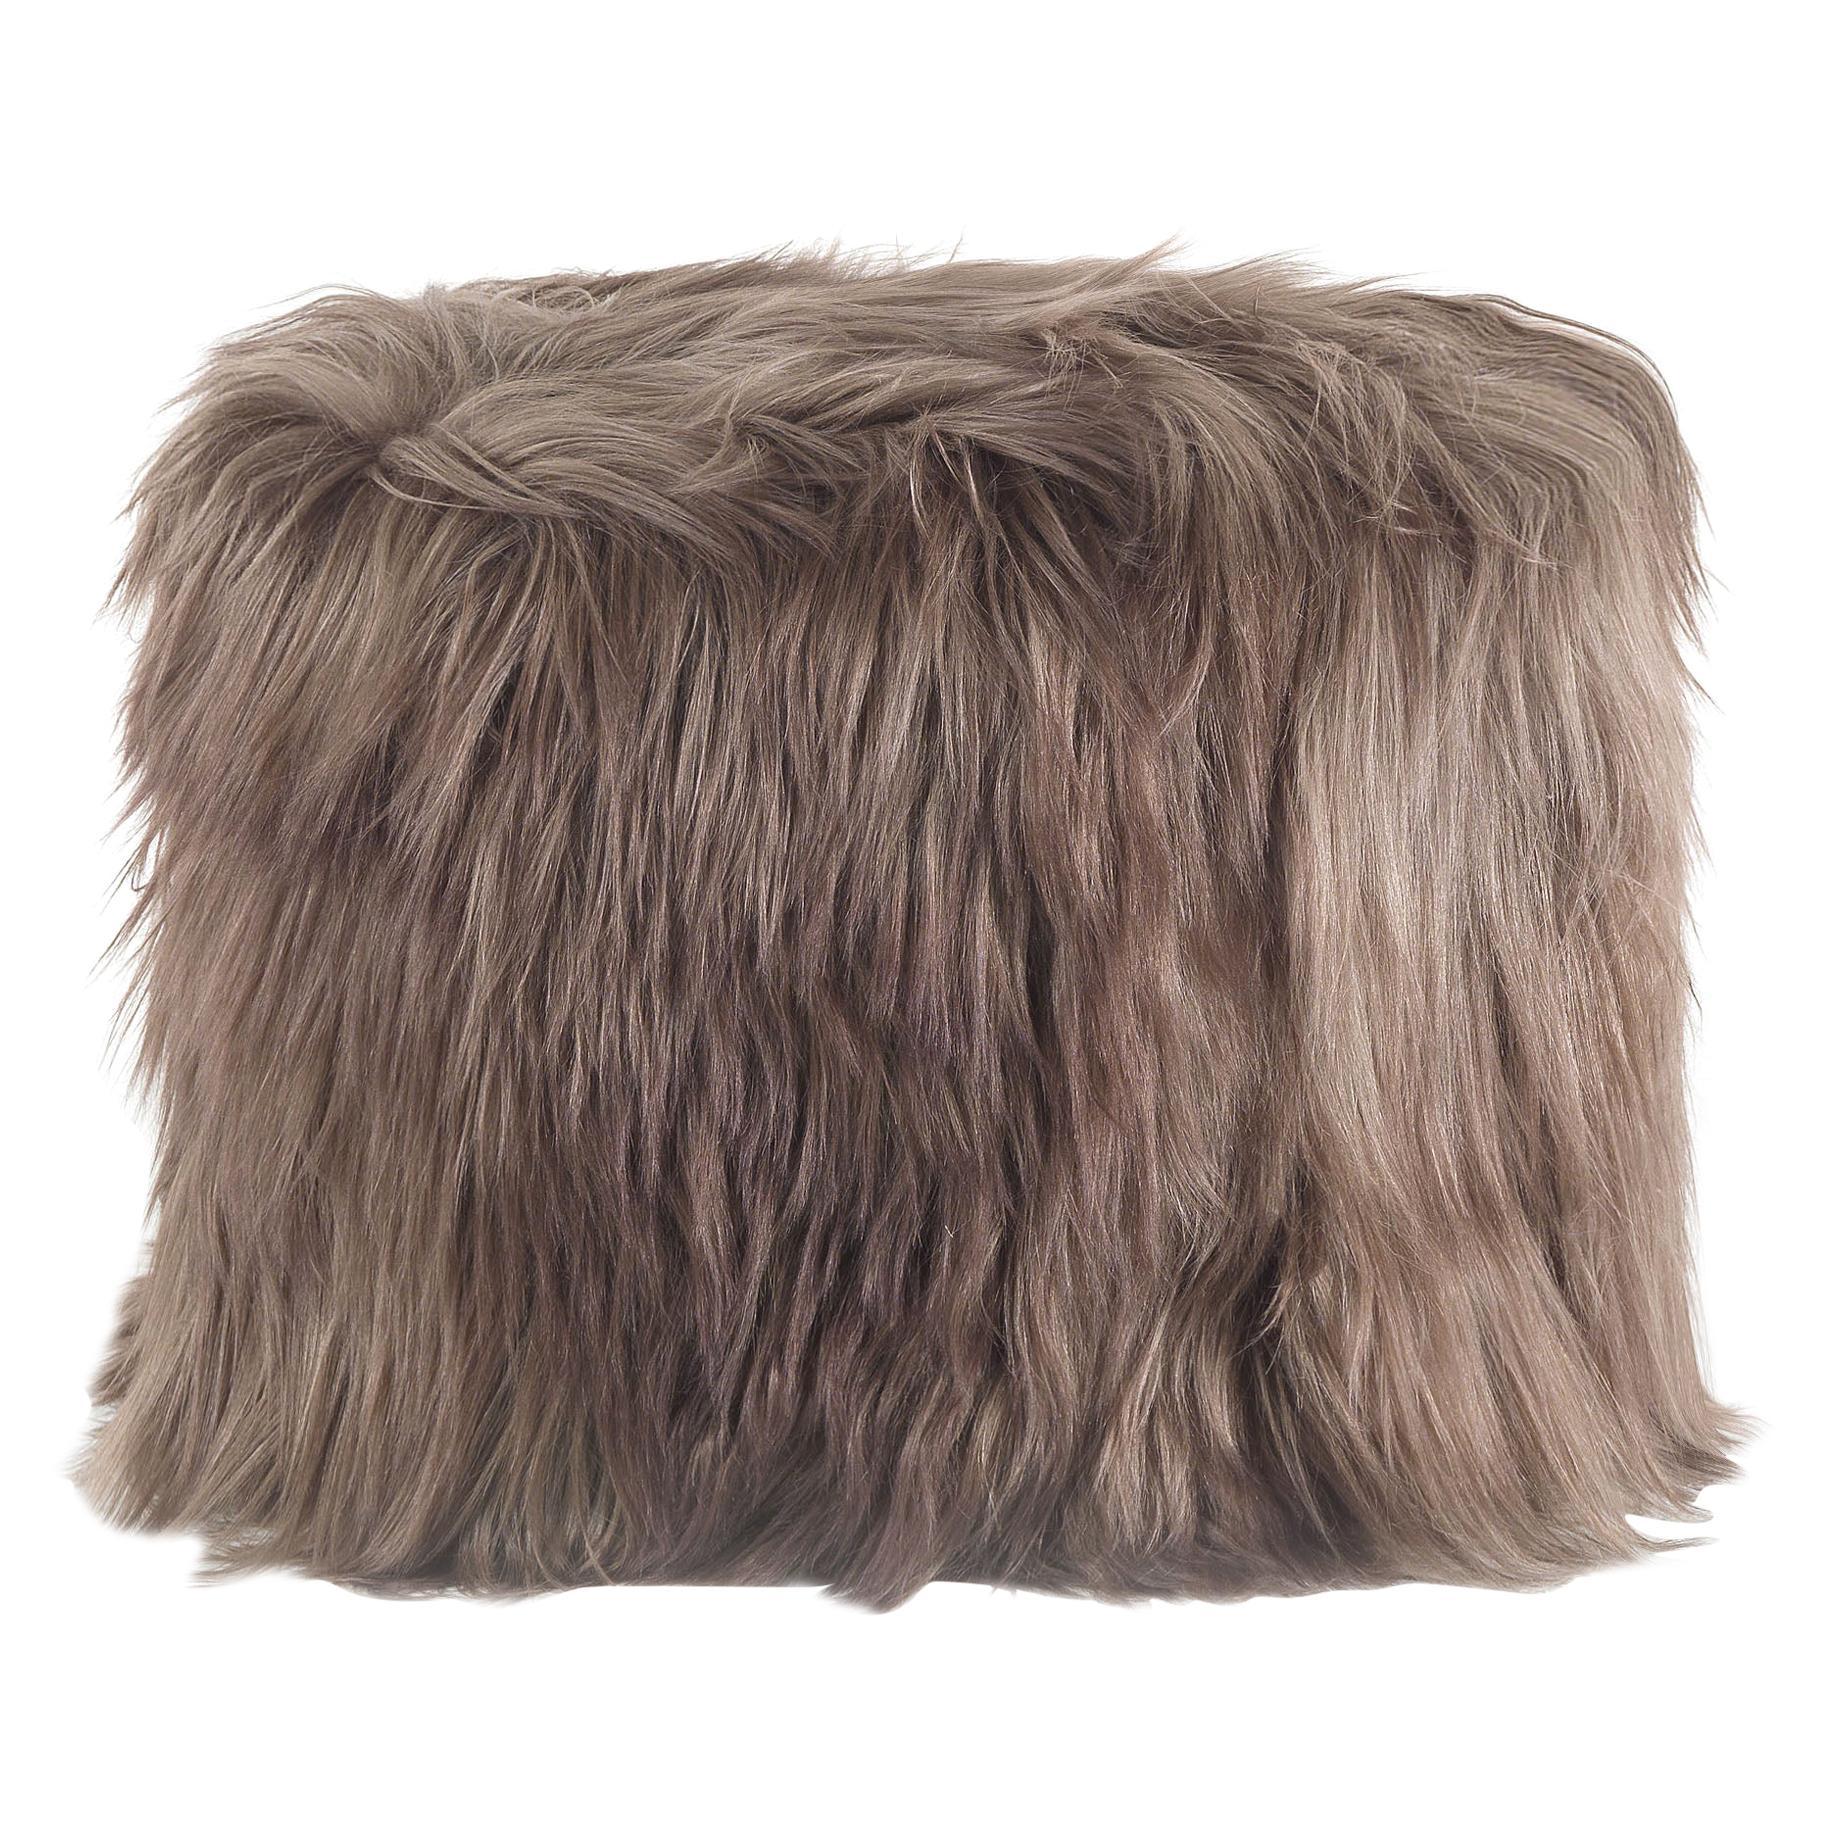 Hera.2 Pouf in Fur by Roberto Cavalli Home Interiors